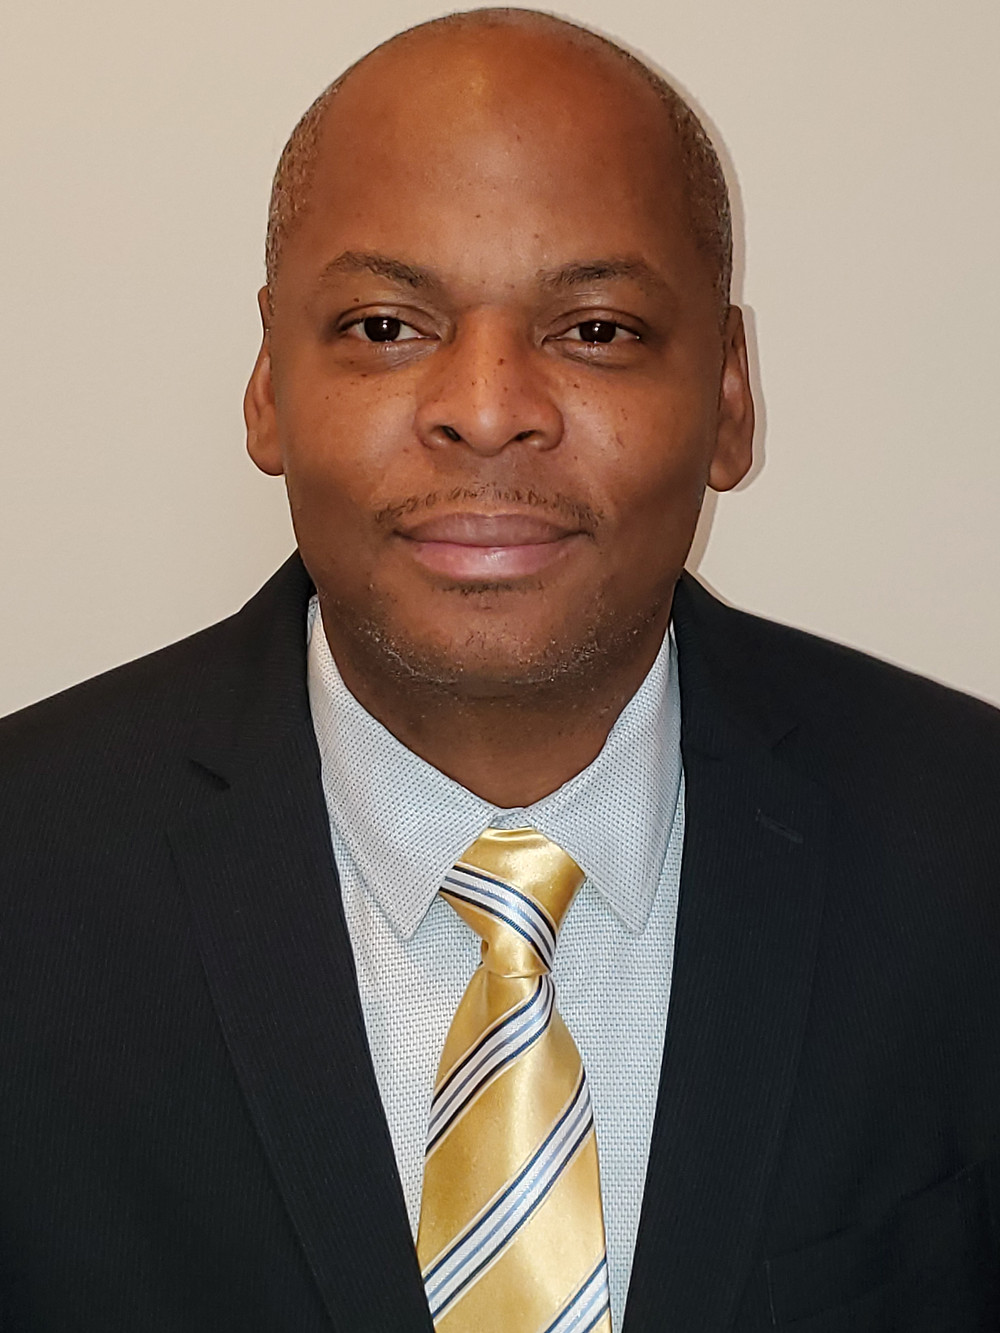 Intelsat Vice President of Investor RelationsTahmin O. Clarke